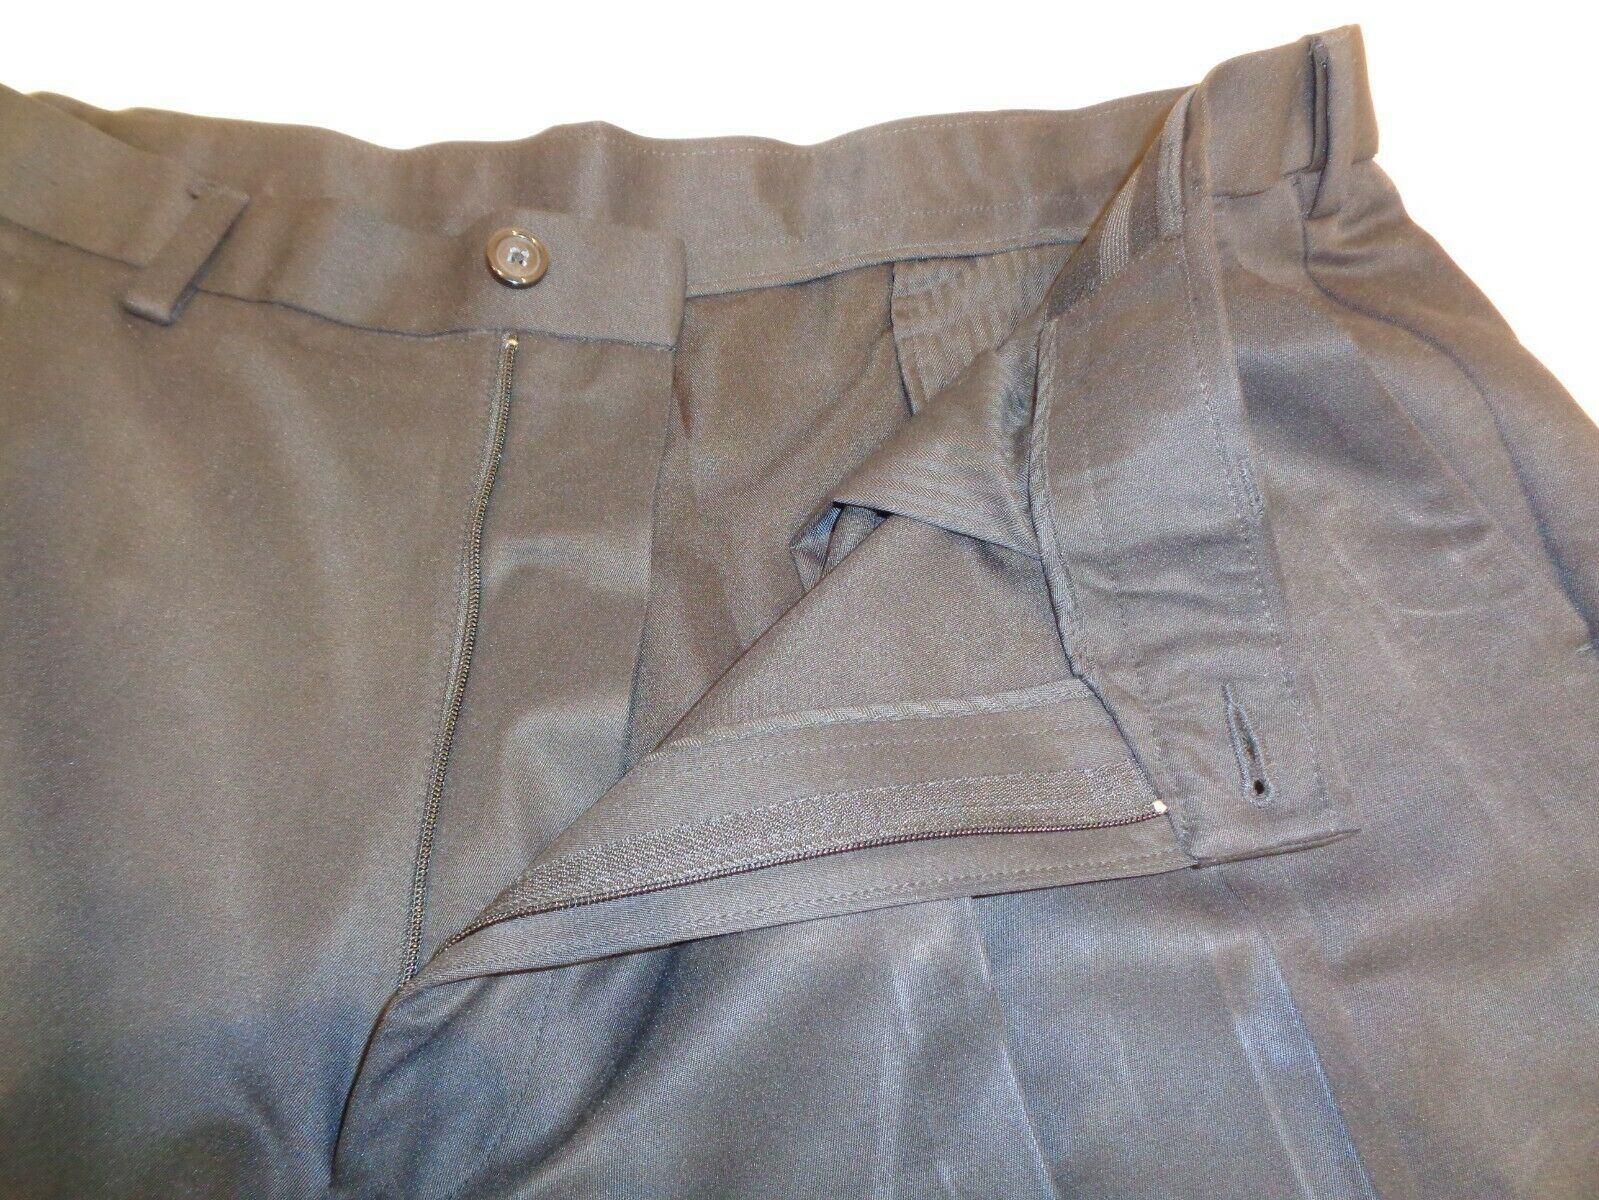 Roundtree & Yorke Size 44 Waist EXPANDER WAISTBAND Black Pleated New Mens Shorts